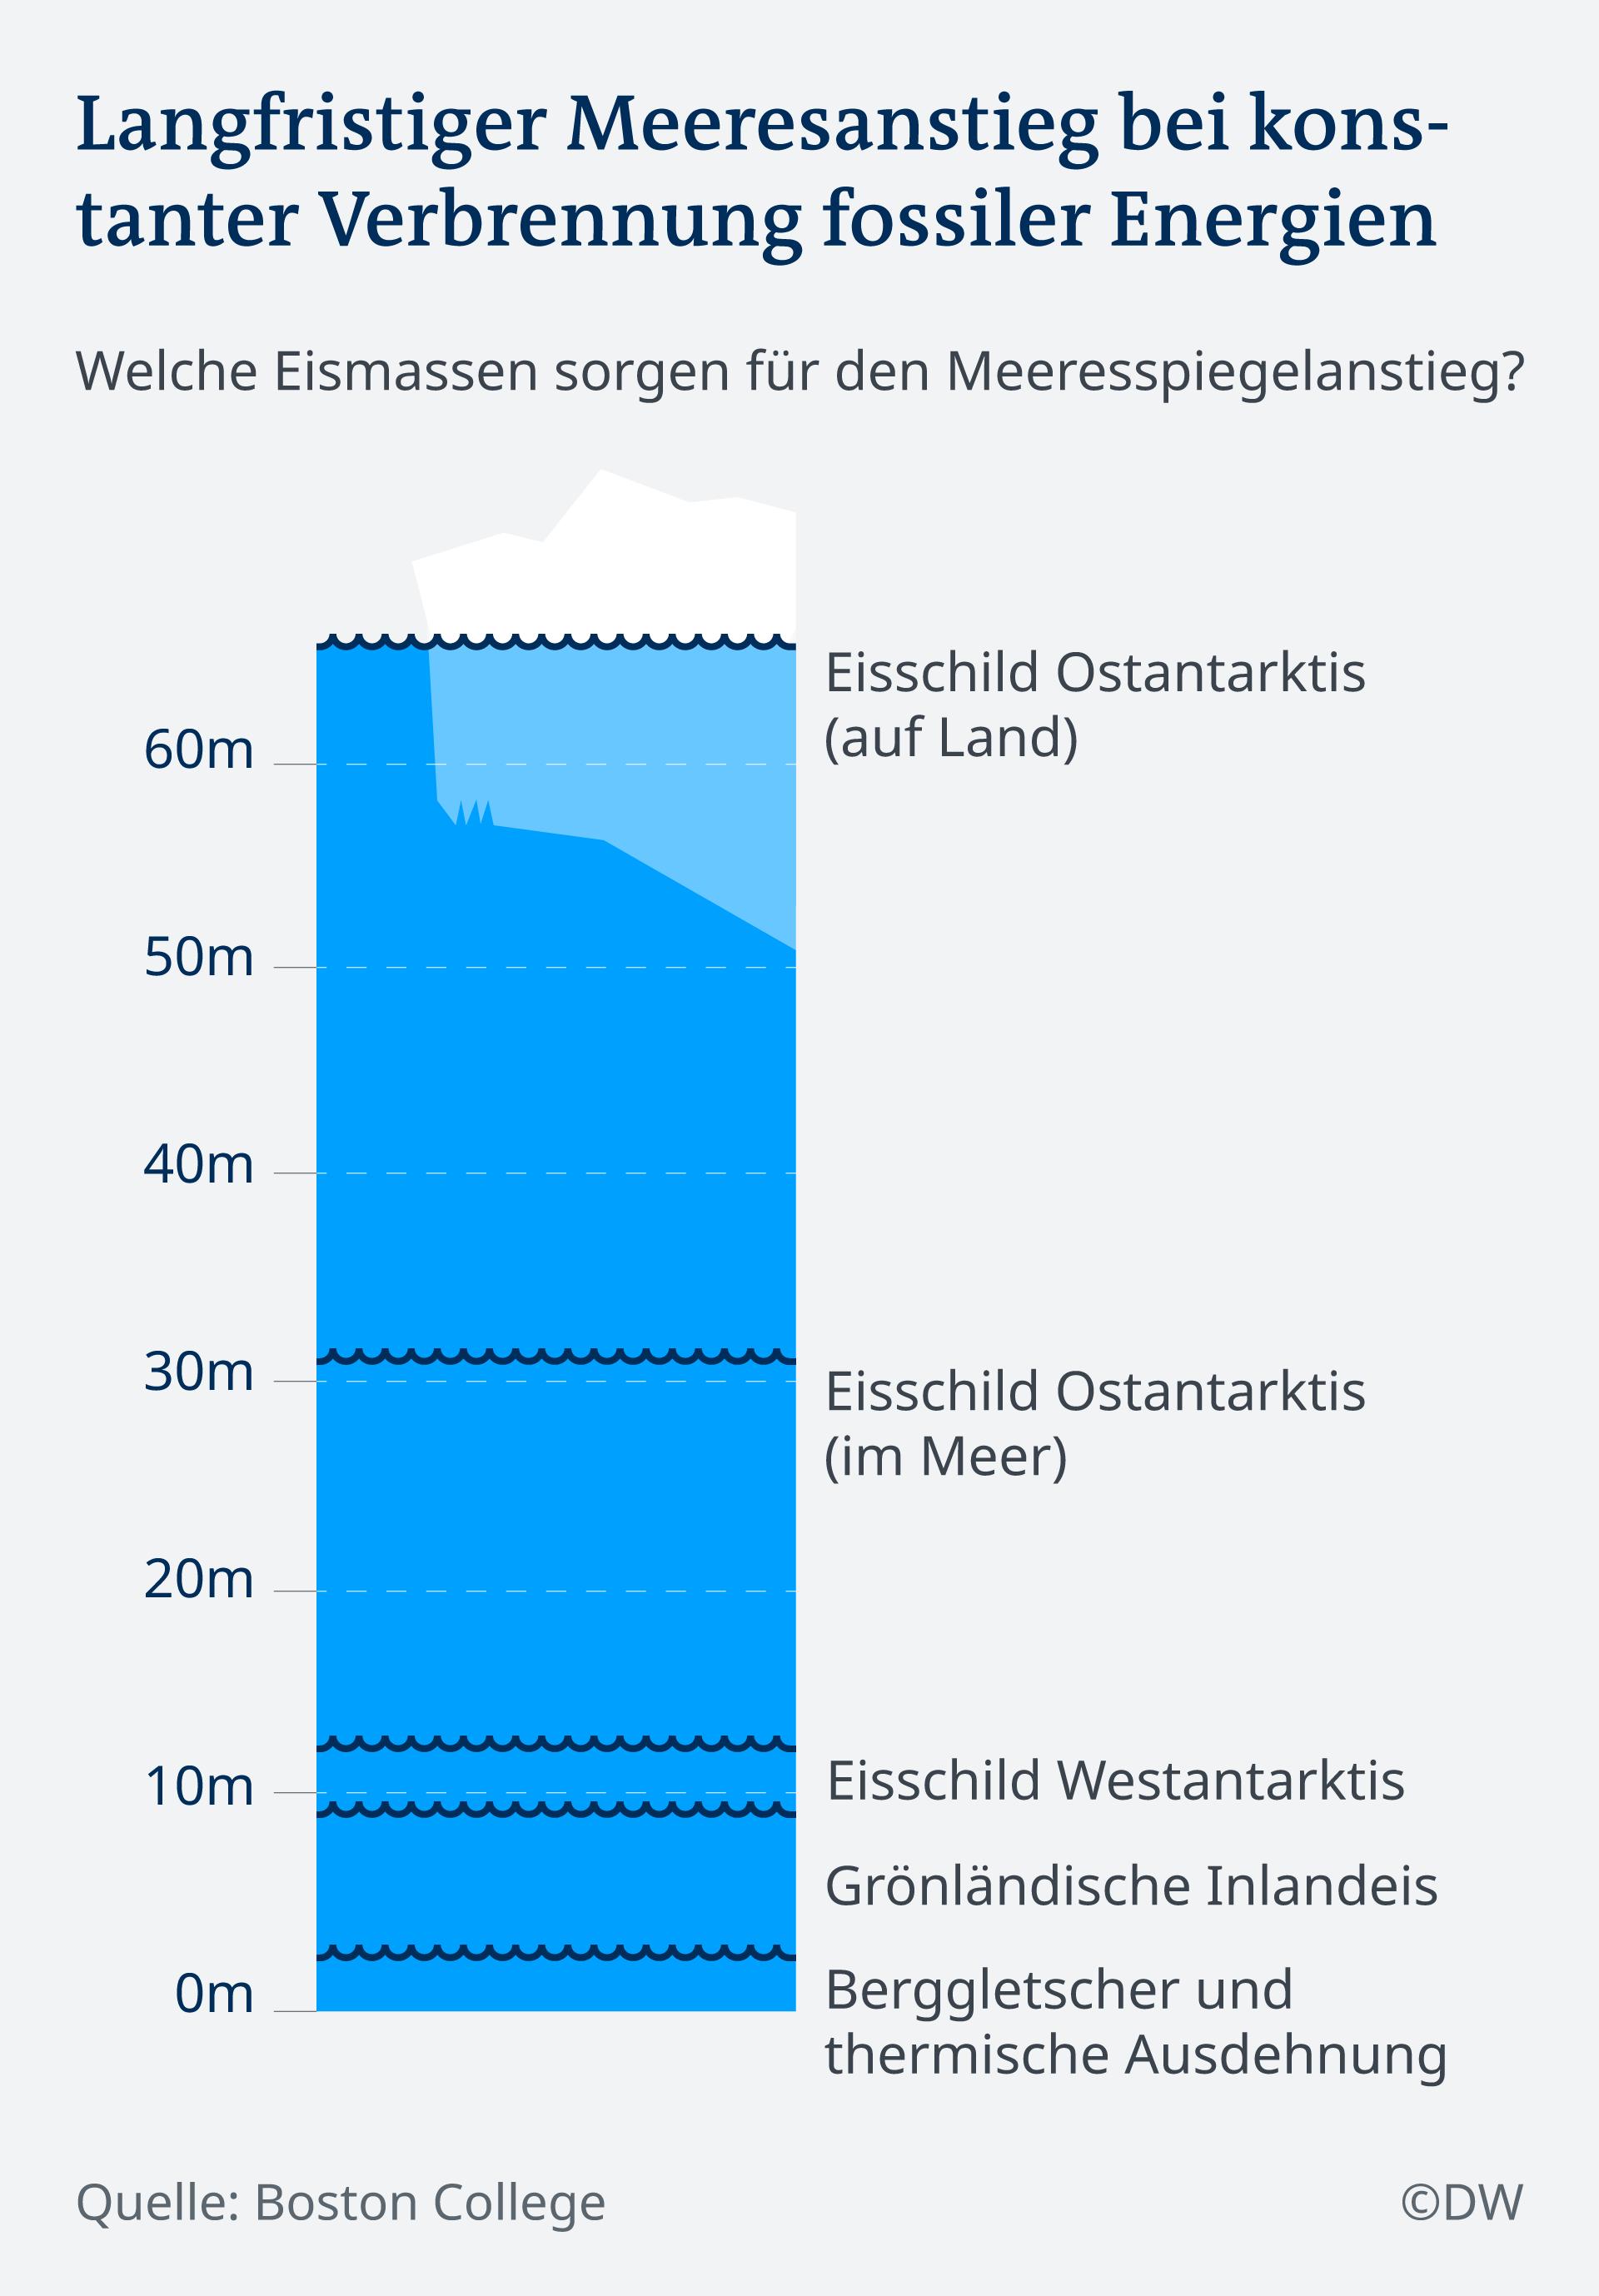 Infografik Langfristiger Meeresanstieg bei konstanter Verbrennung fossiler Energien DE